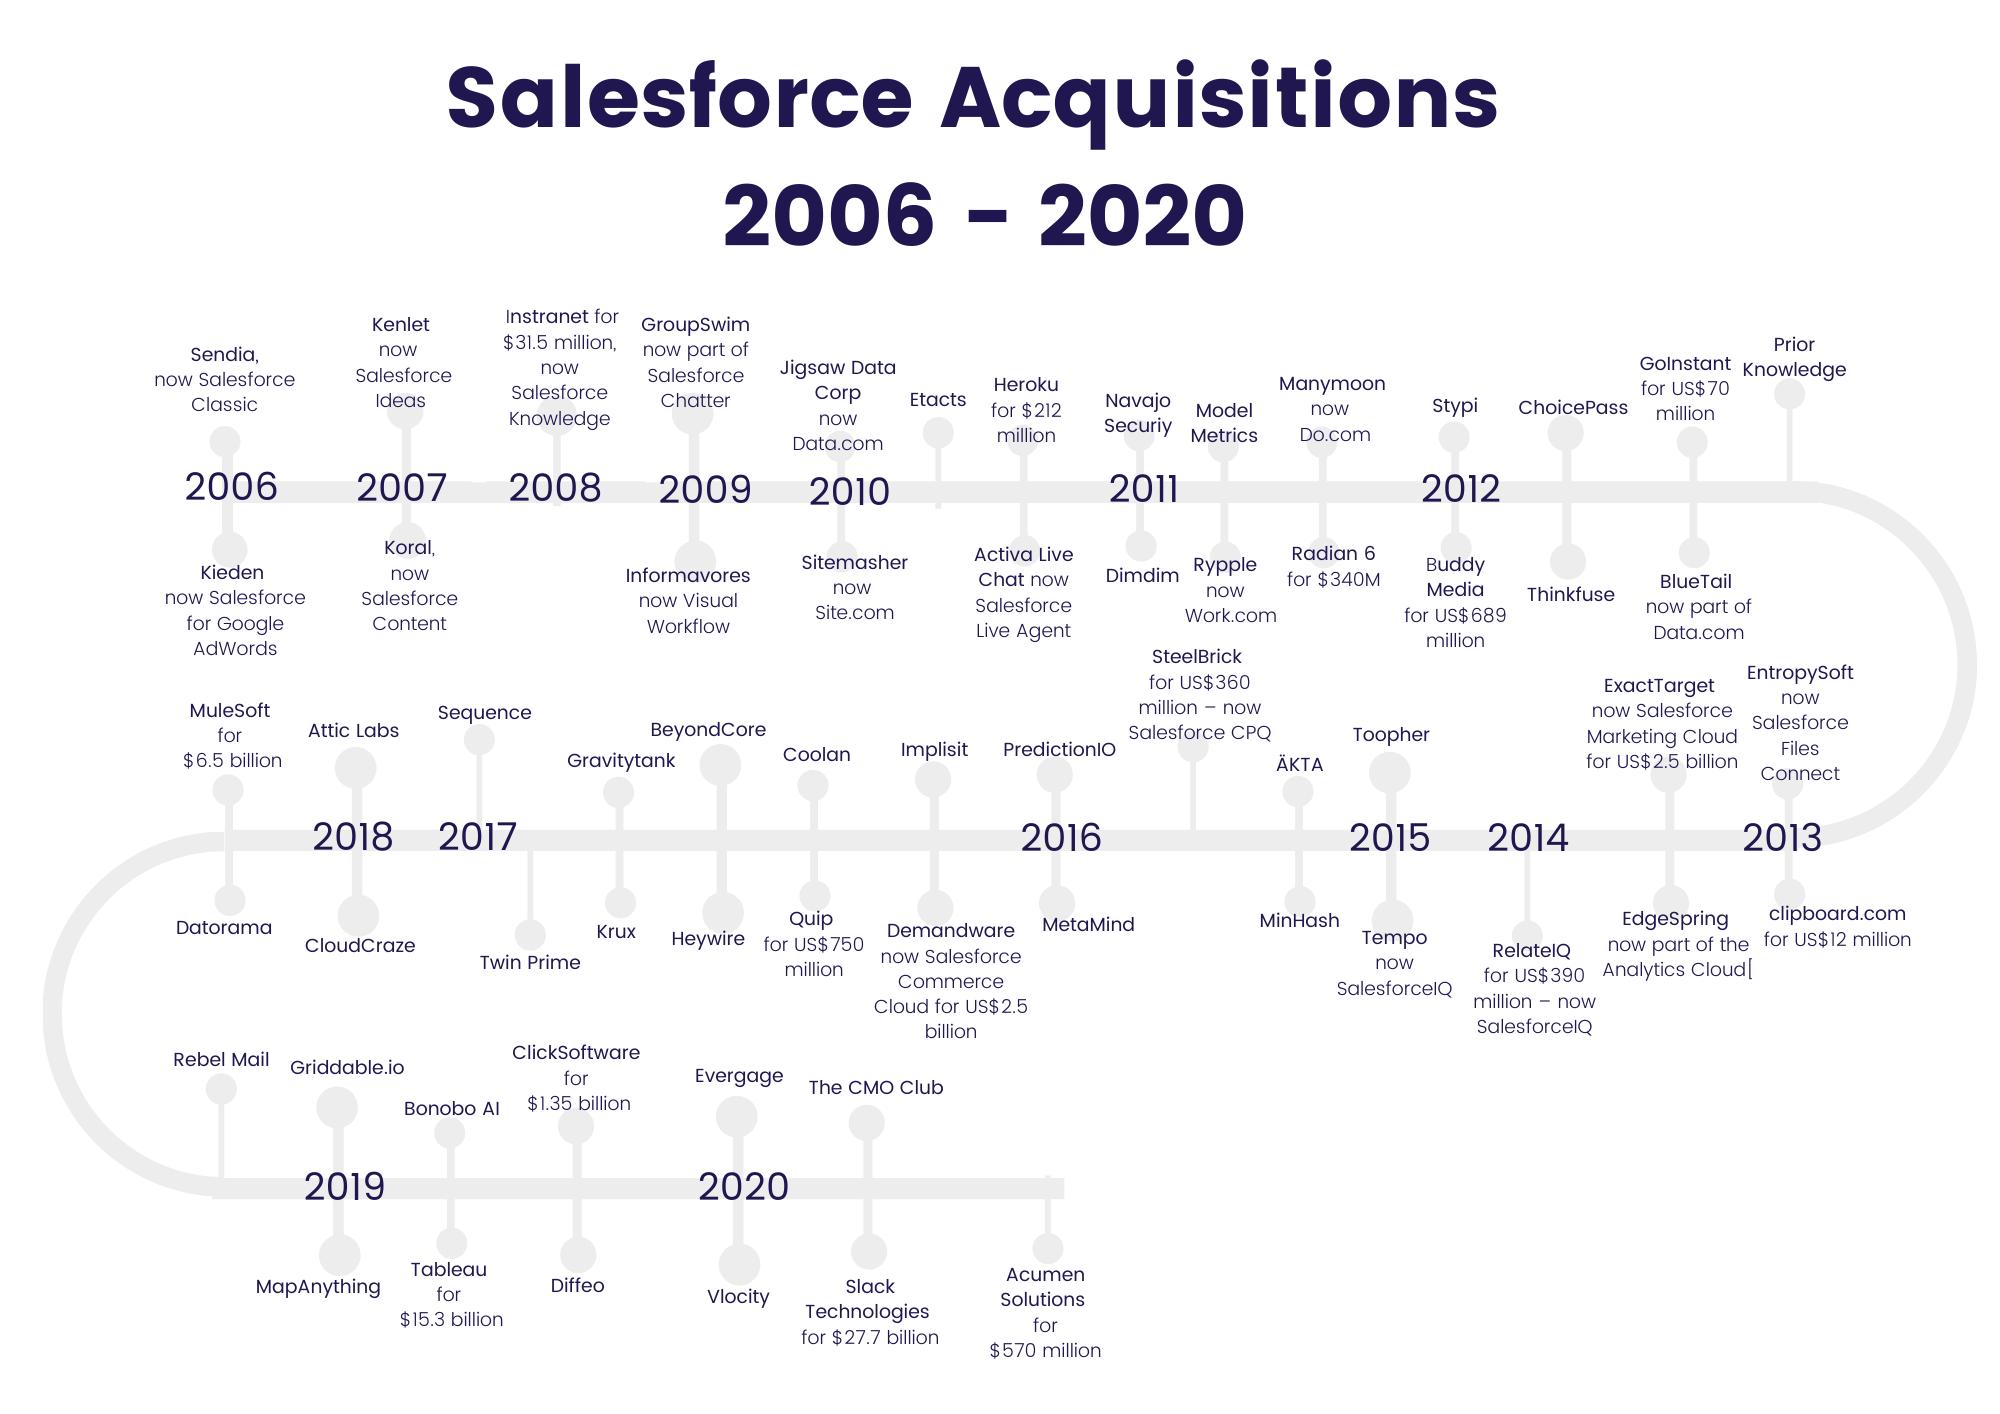 Salesforce-Akquisition